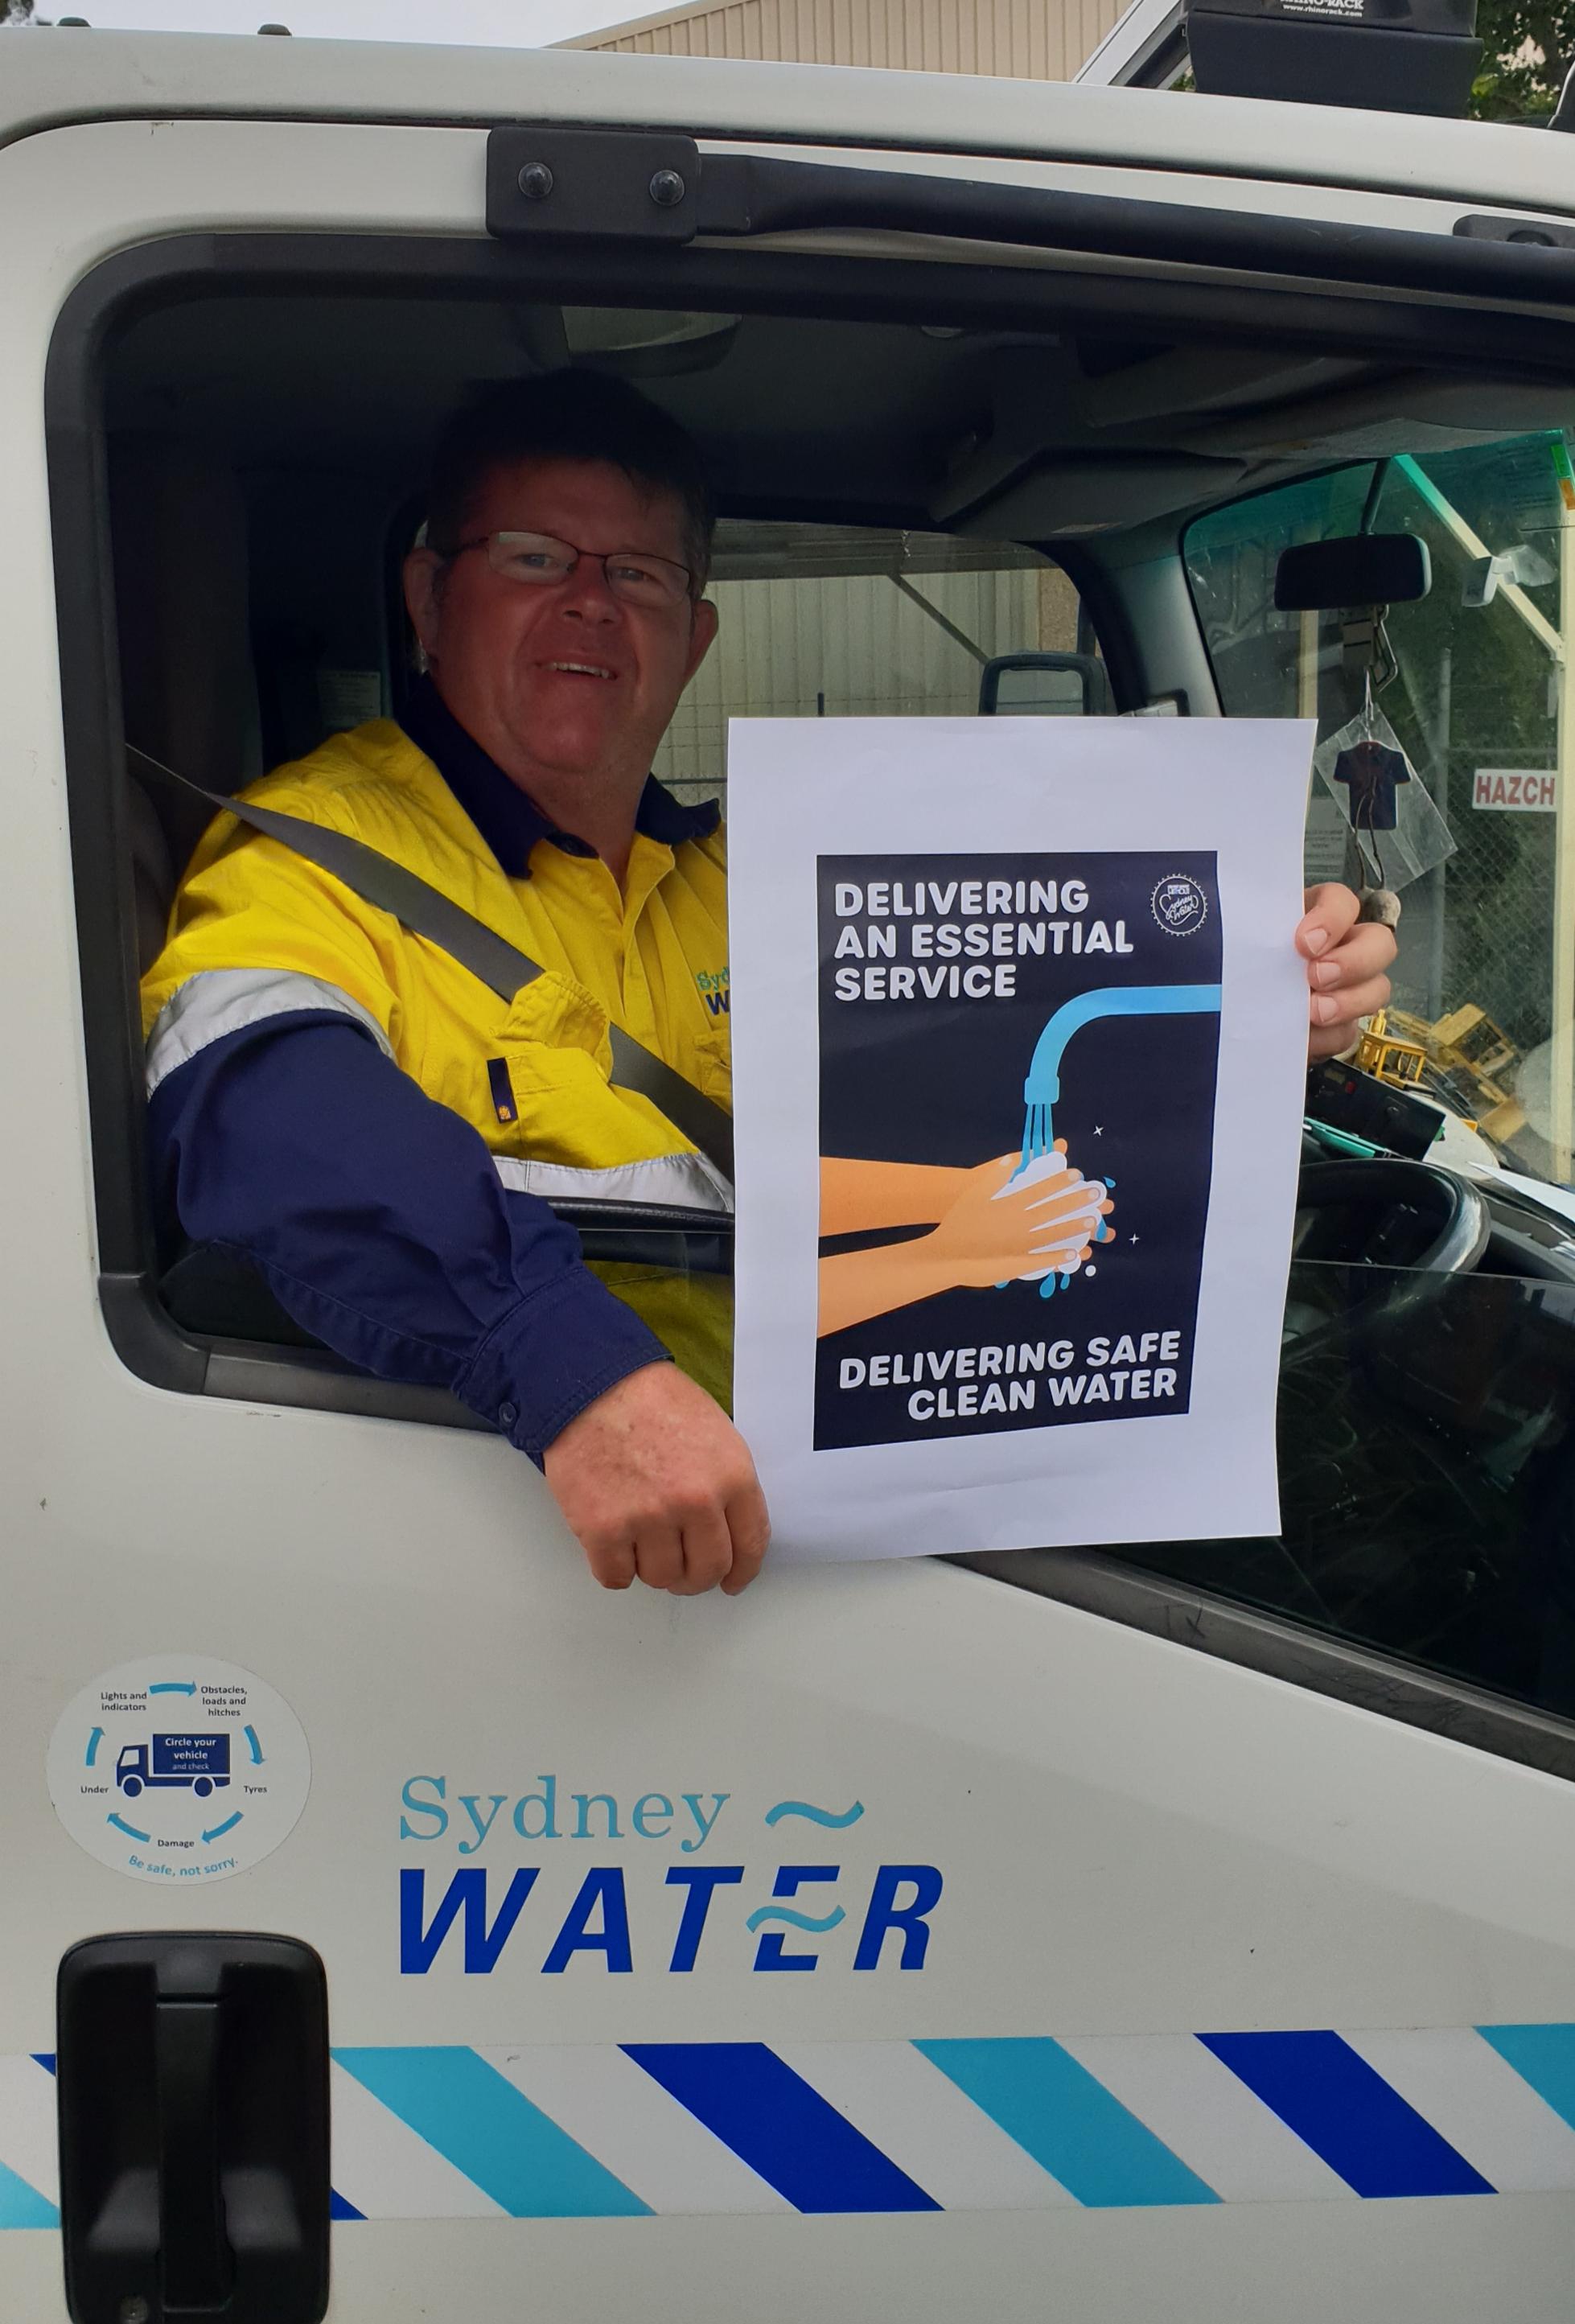 Sydney Water Worker